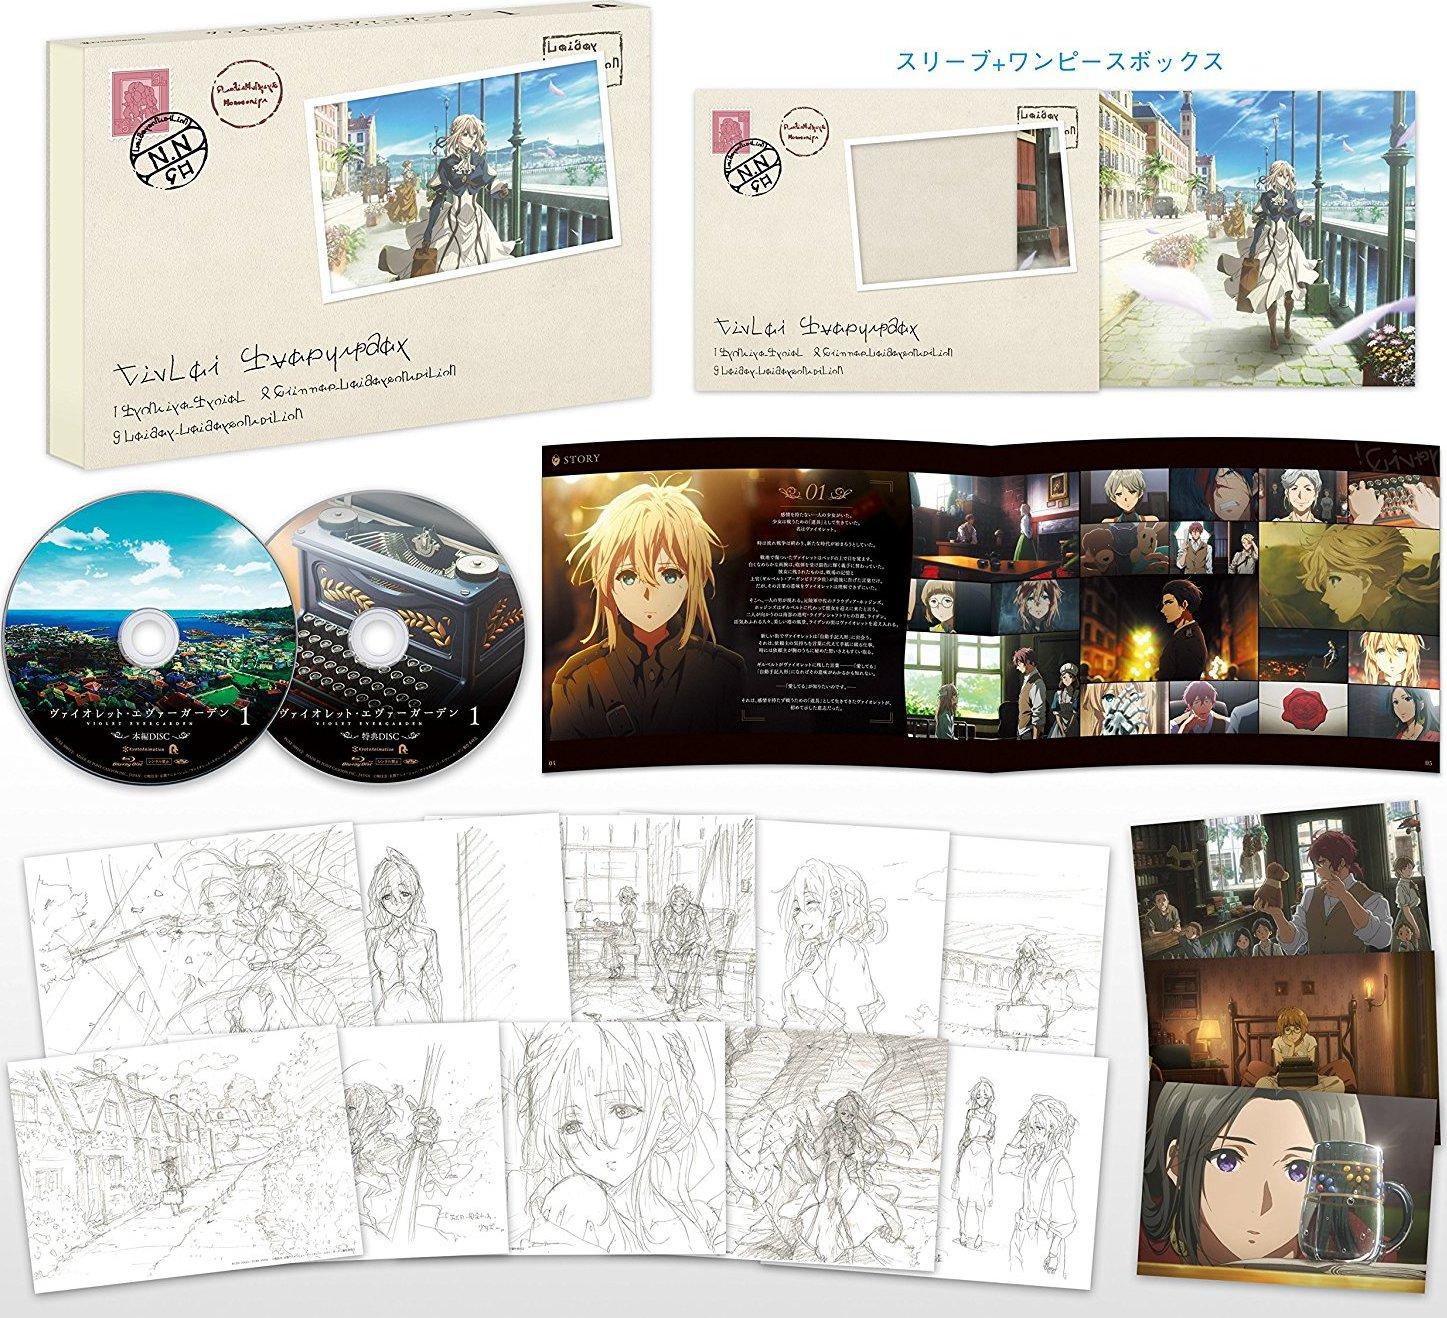 Violet Evergarden Vol  1 Blu-ray (Japan)